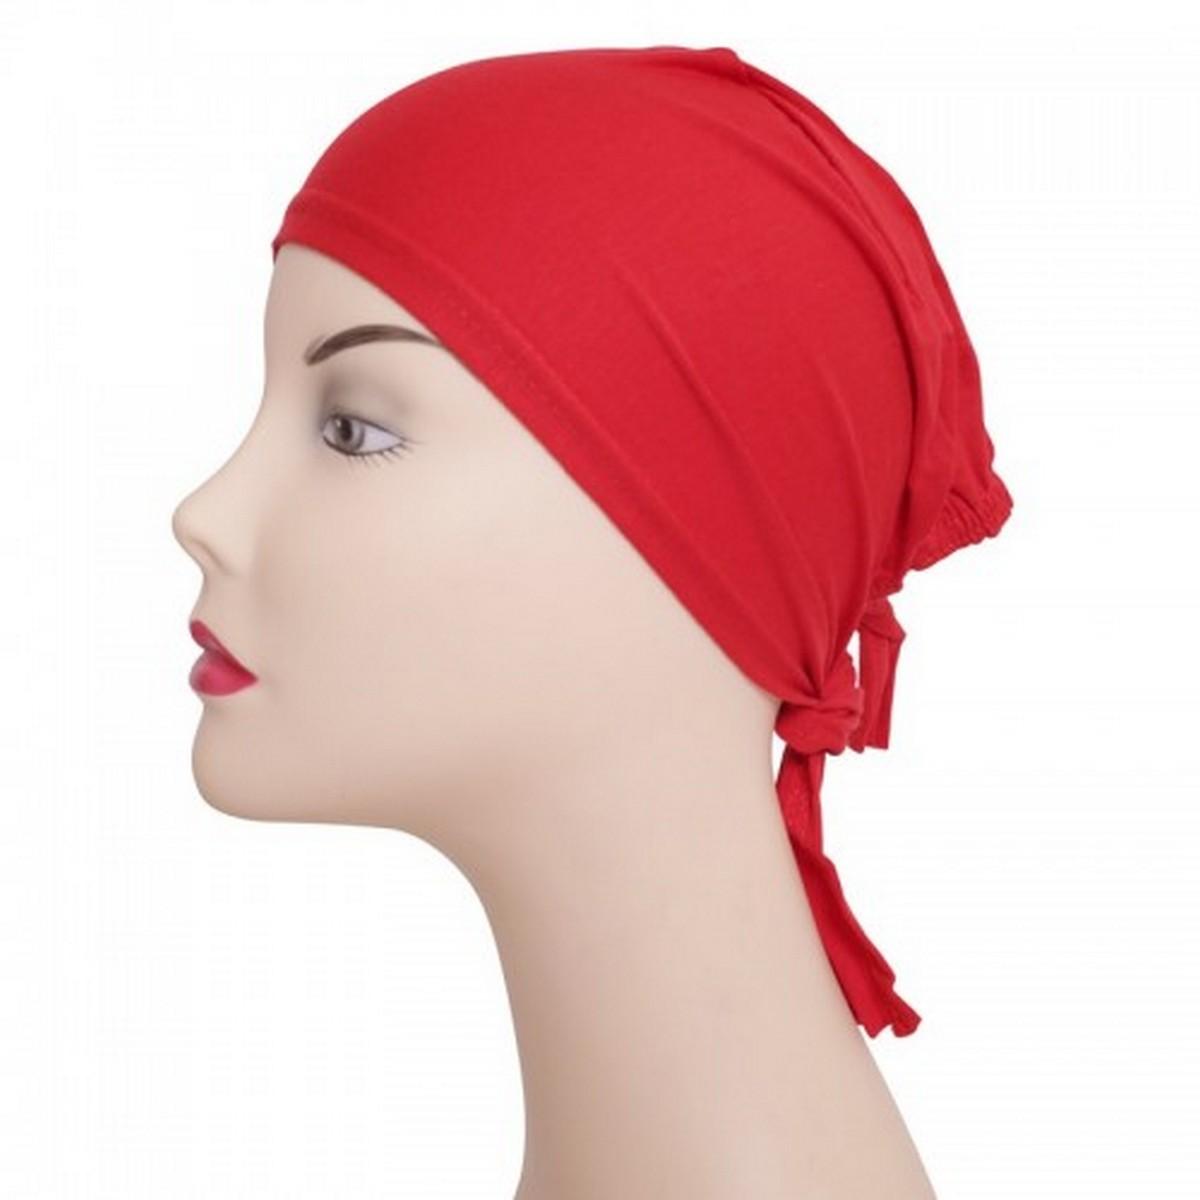 Plain hijab cap Red, Skin, Navy Blue, Blue, Pink, Brown, Green, Maroon, Purple Hijab Caps for Girls JK Cart Inner Hijab Scarf Islamic Under Scarf Cotton Islamic Hat Abaya Cap